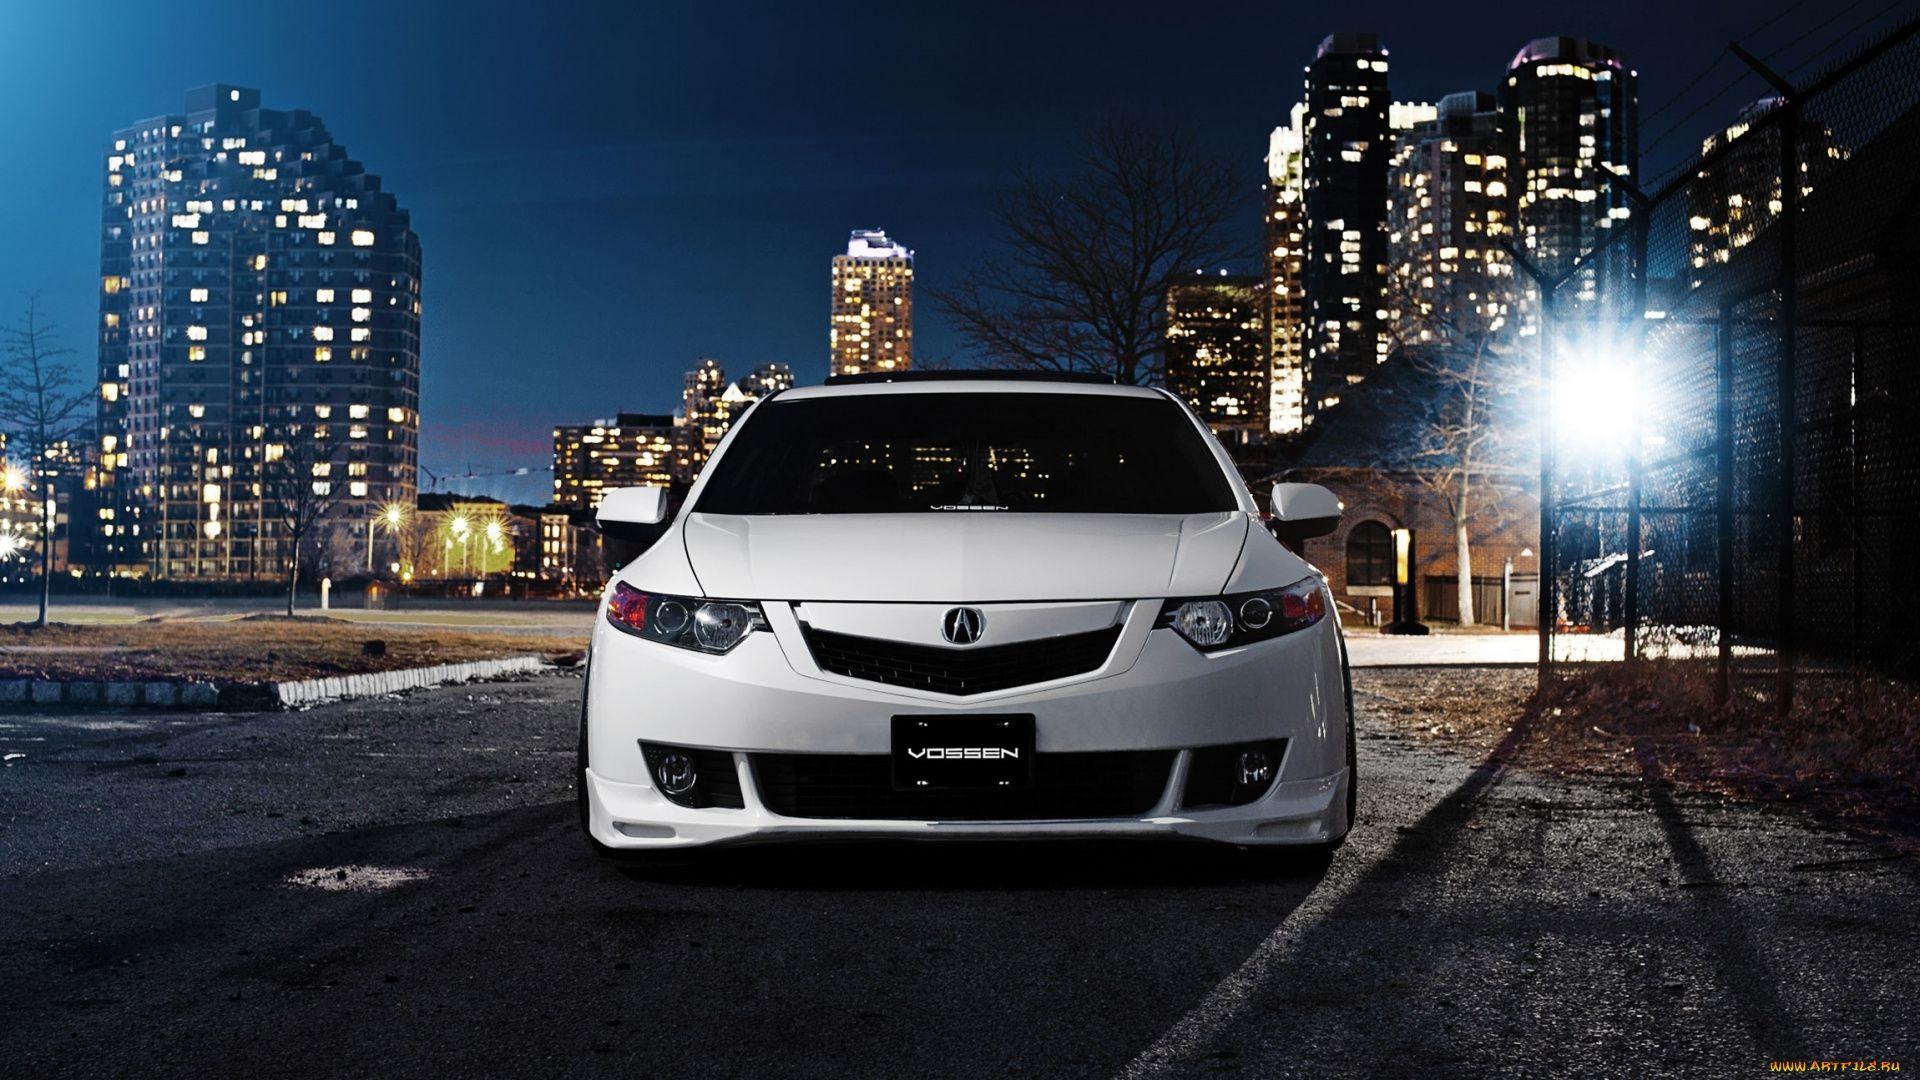 Honda Accord picture image